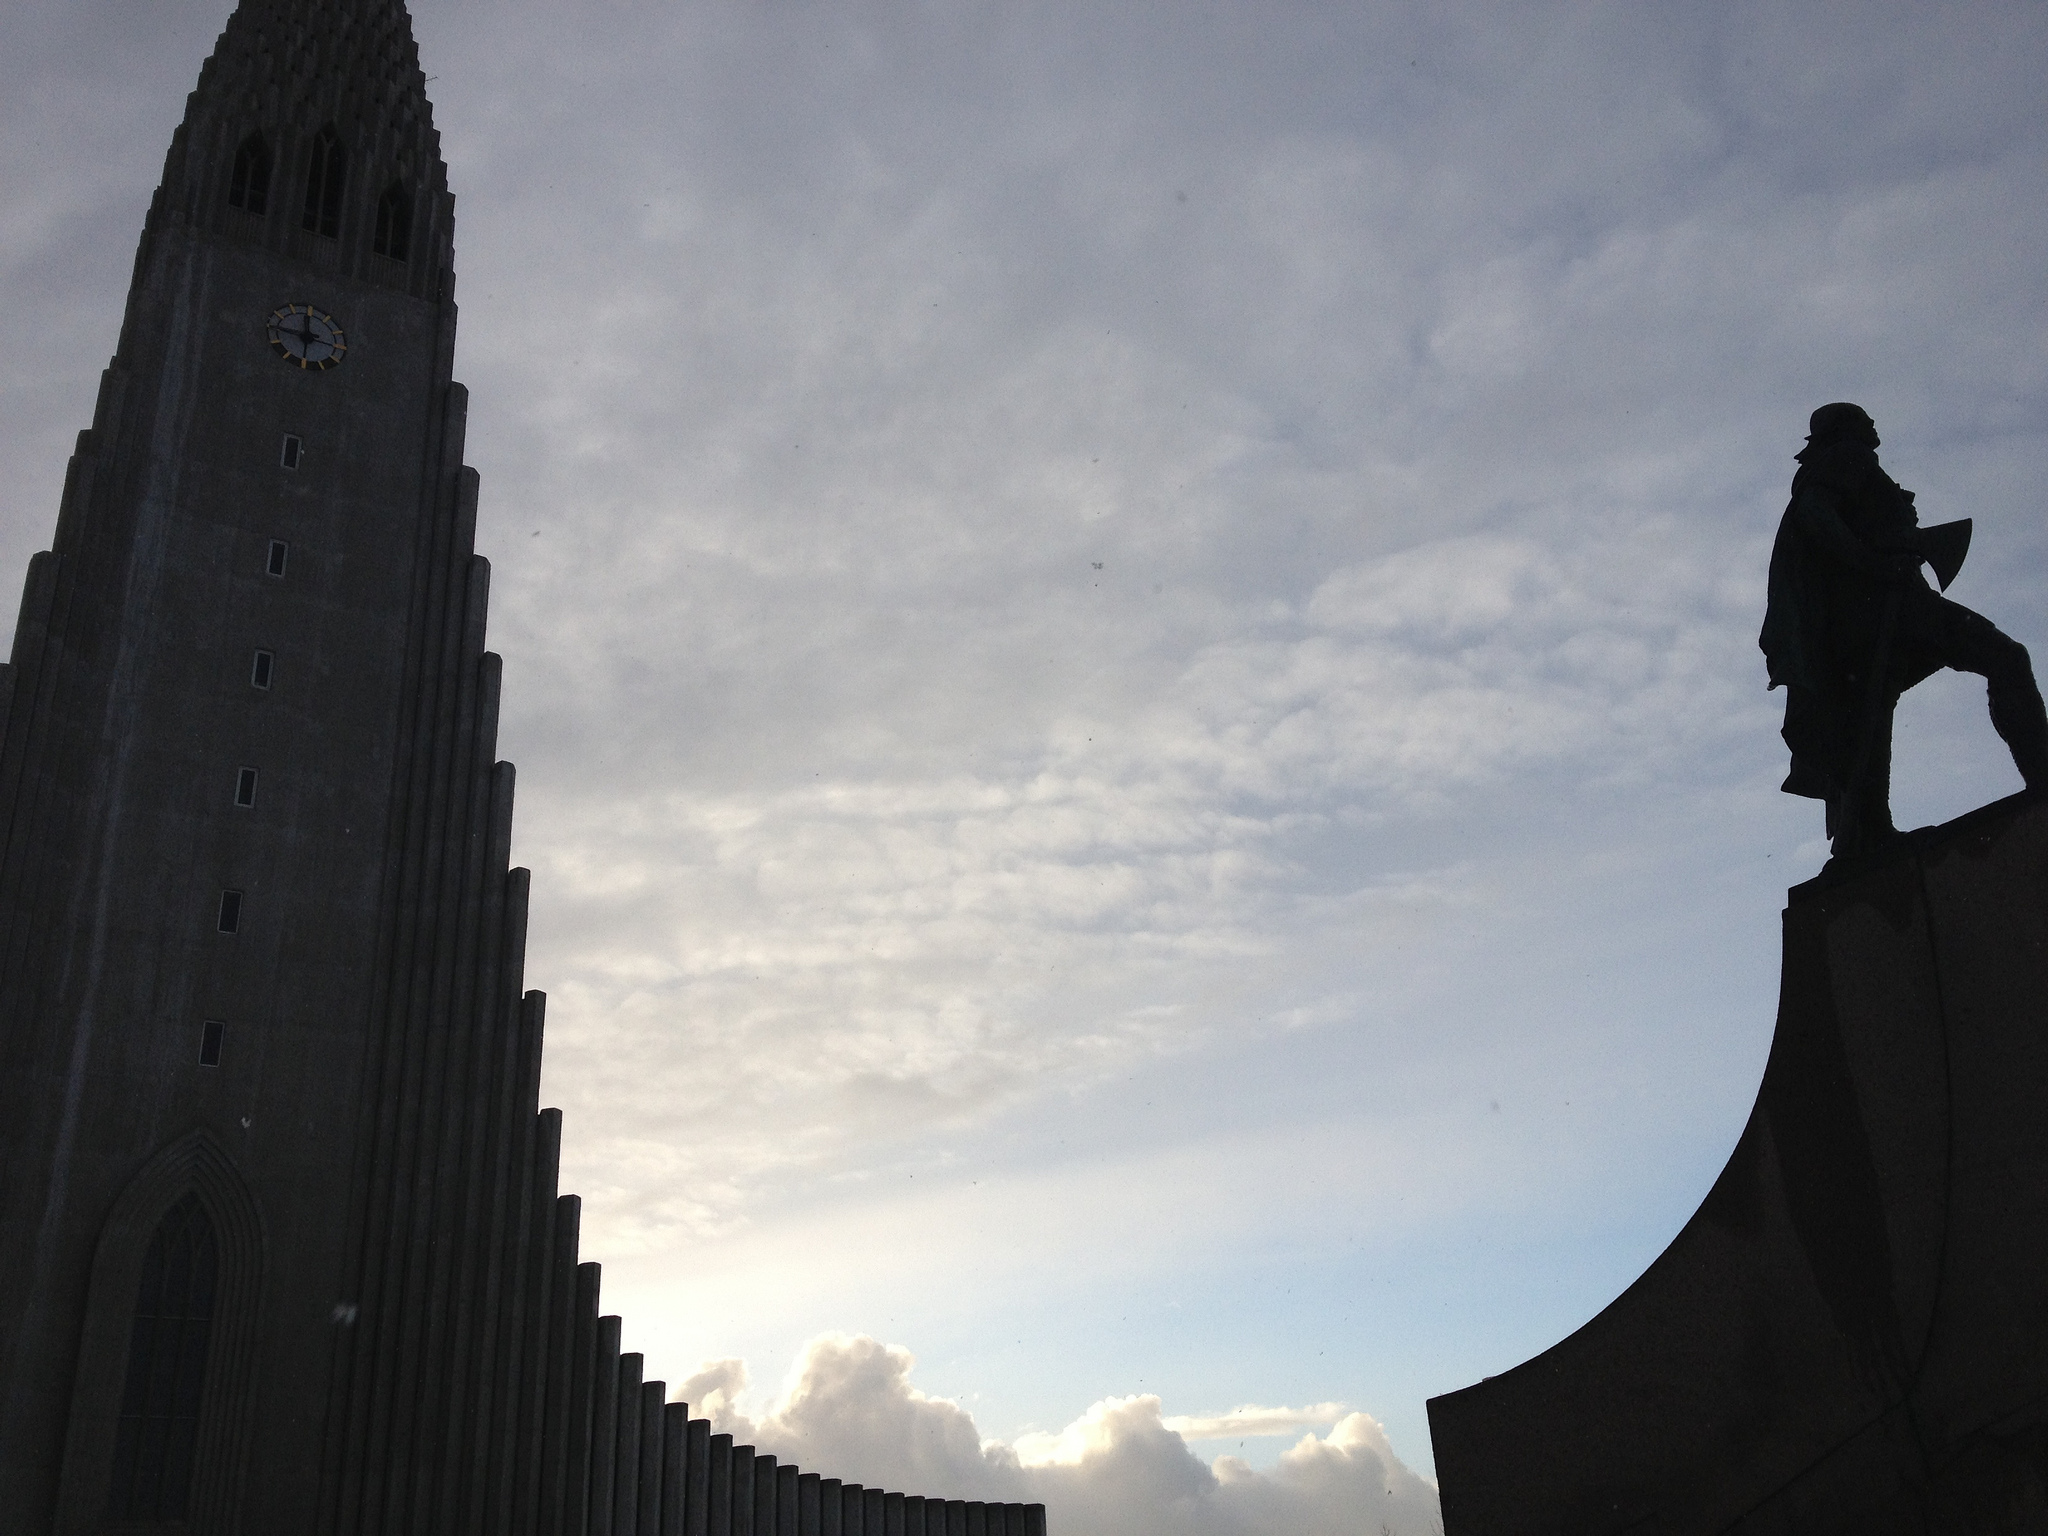 A rather dark photo of Hallgrímskirkja and the Leifur Eiríksson statue. In early February Reykjavik gets less than 8 hours daylight.